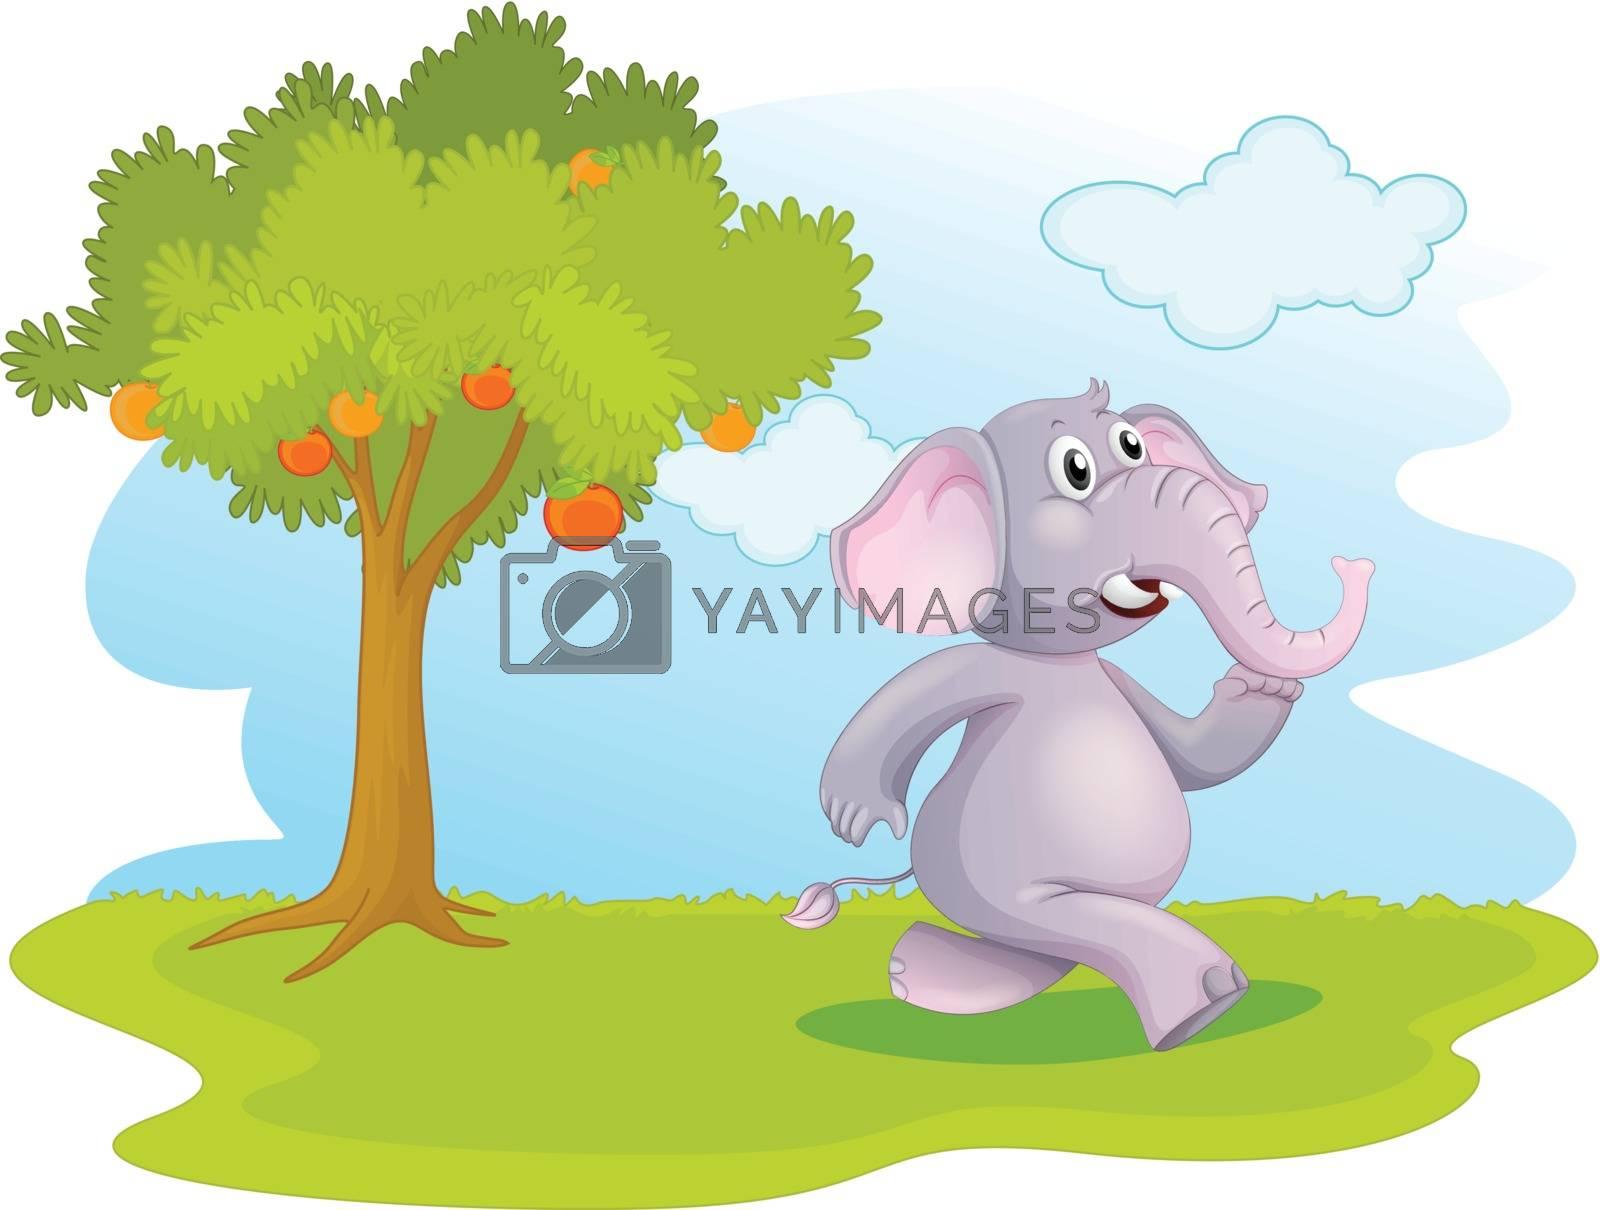 Illustration of an elephant running near the orange tree on a white background